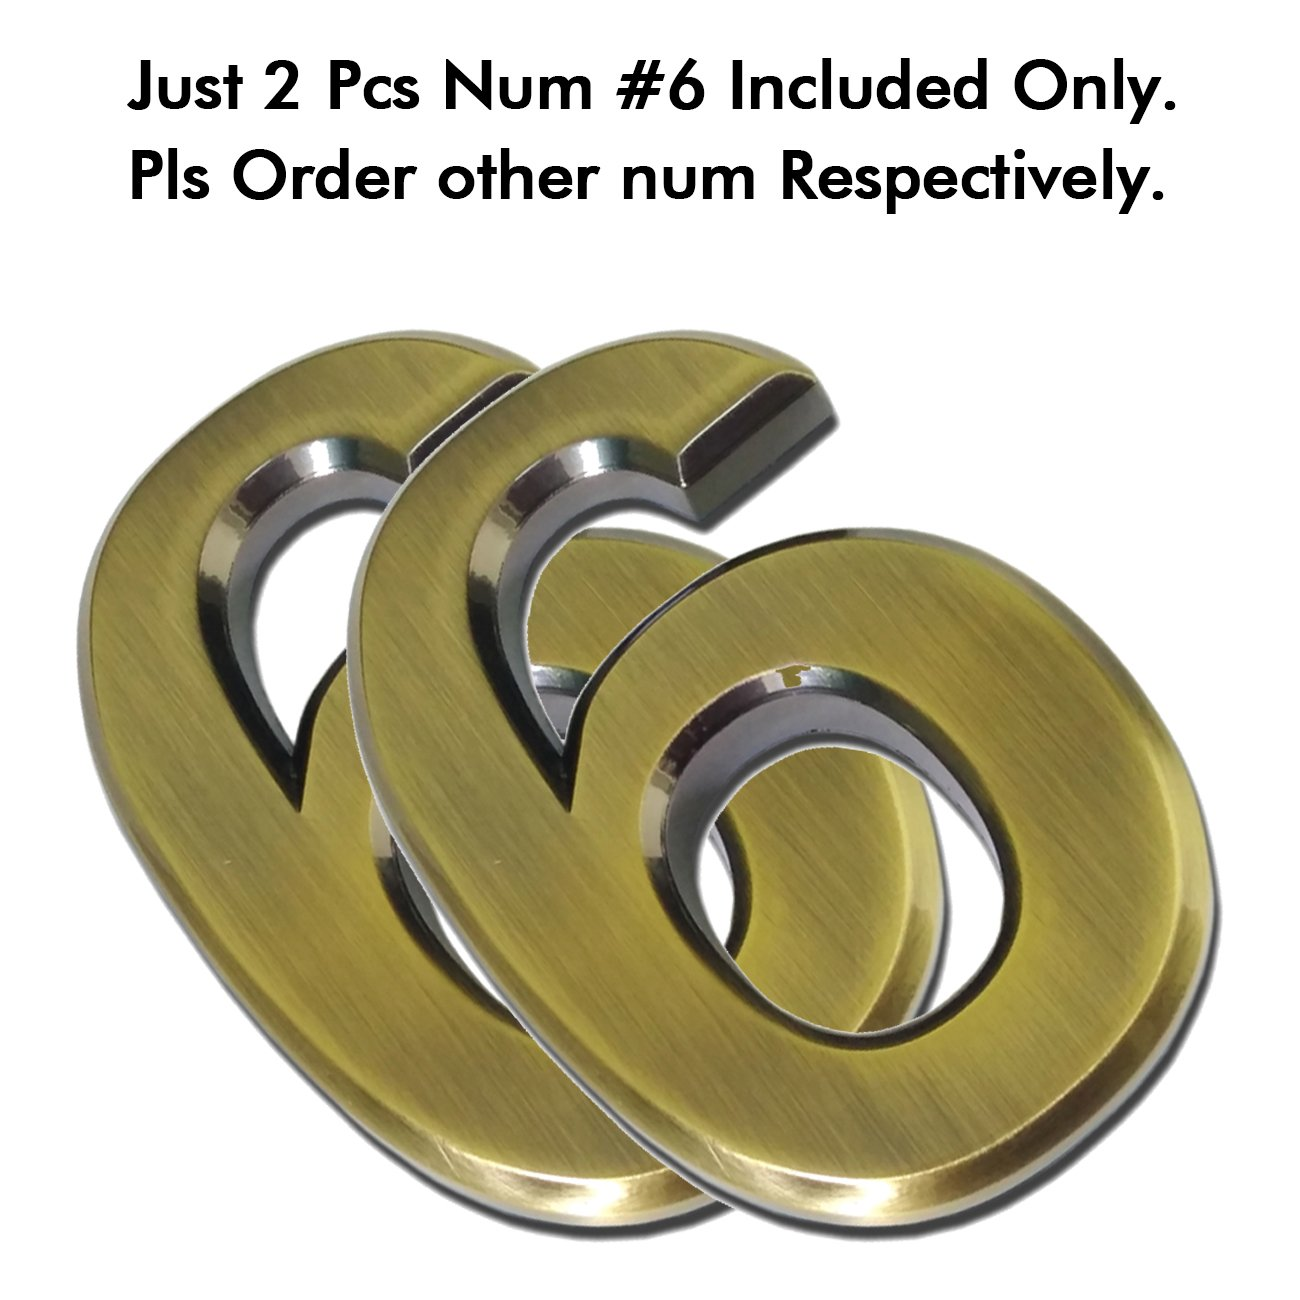 #0, Messing moderne Hausnummer je 1,9 cm 2er-Pack schwebender Effekt einfach zu installieren Magicdo Zahl aus massivem 2er-Pack